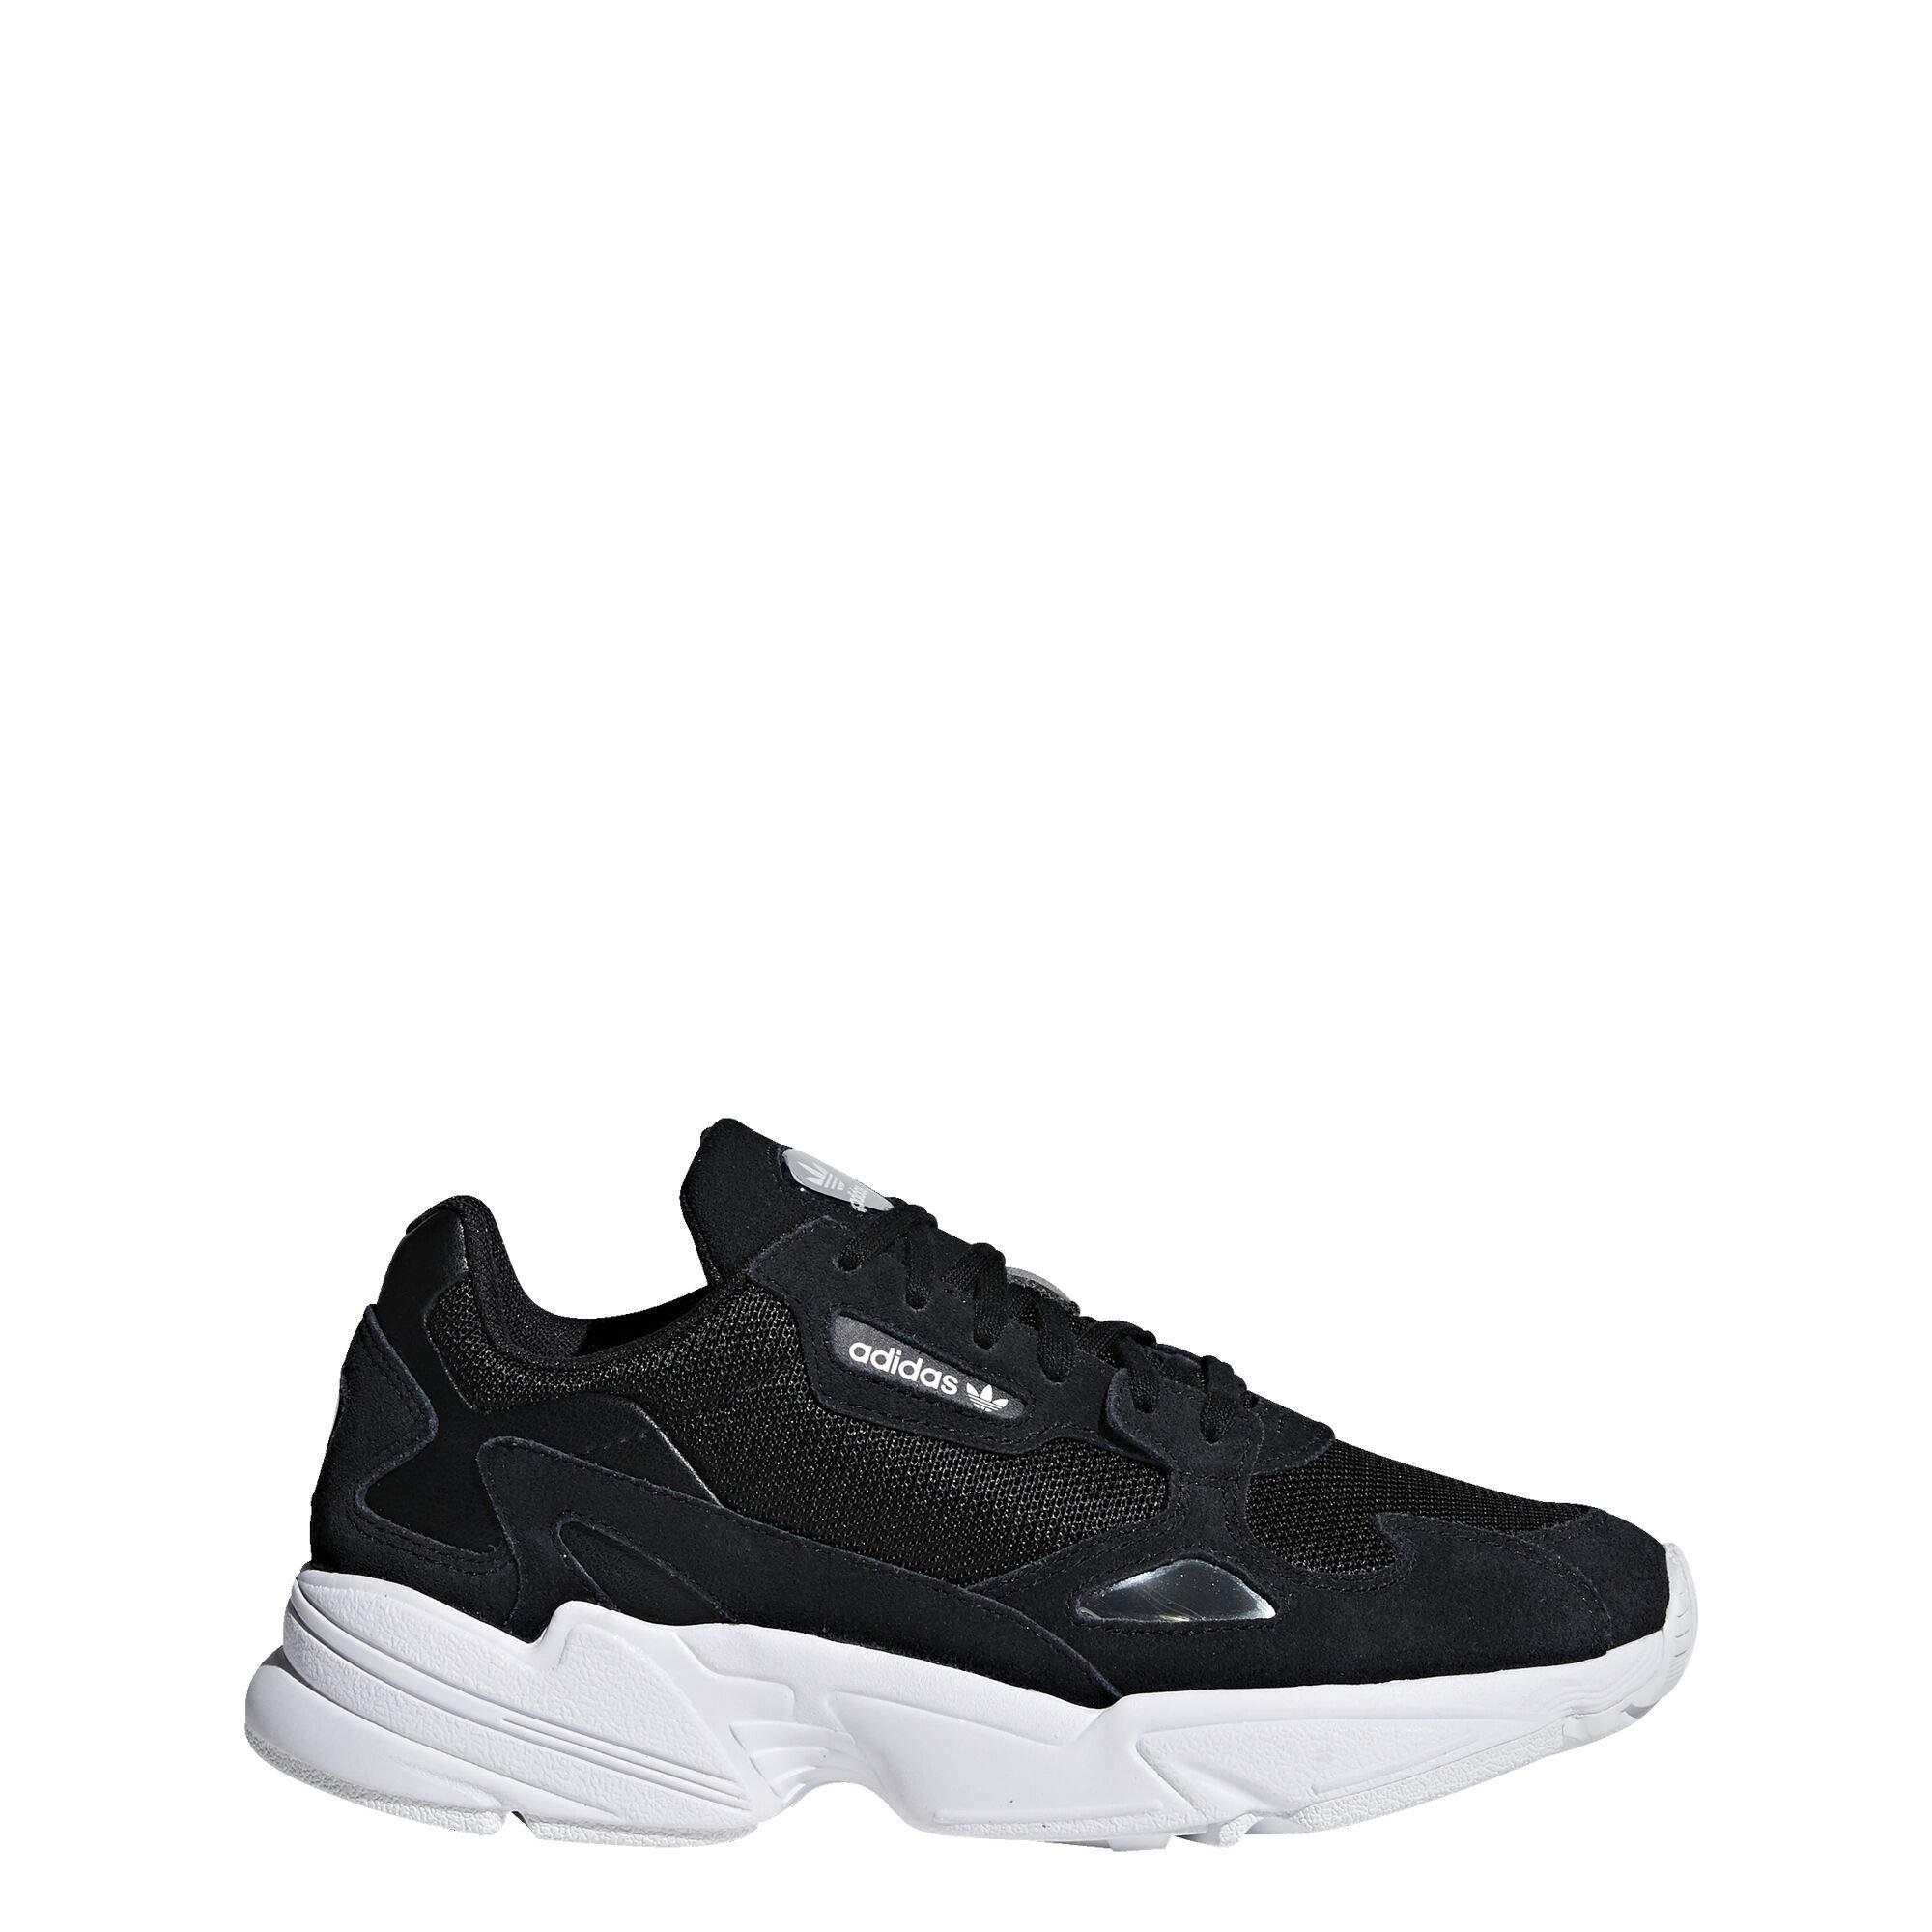 adidas Originals Women's Falcon Sneaker, Black/Black/White, 11 M US